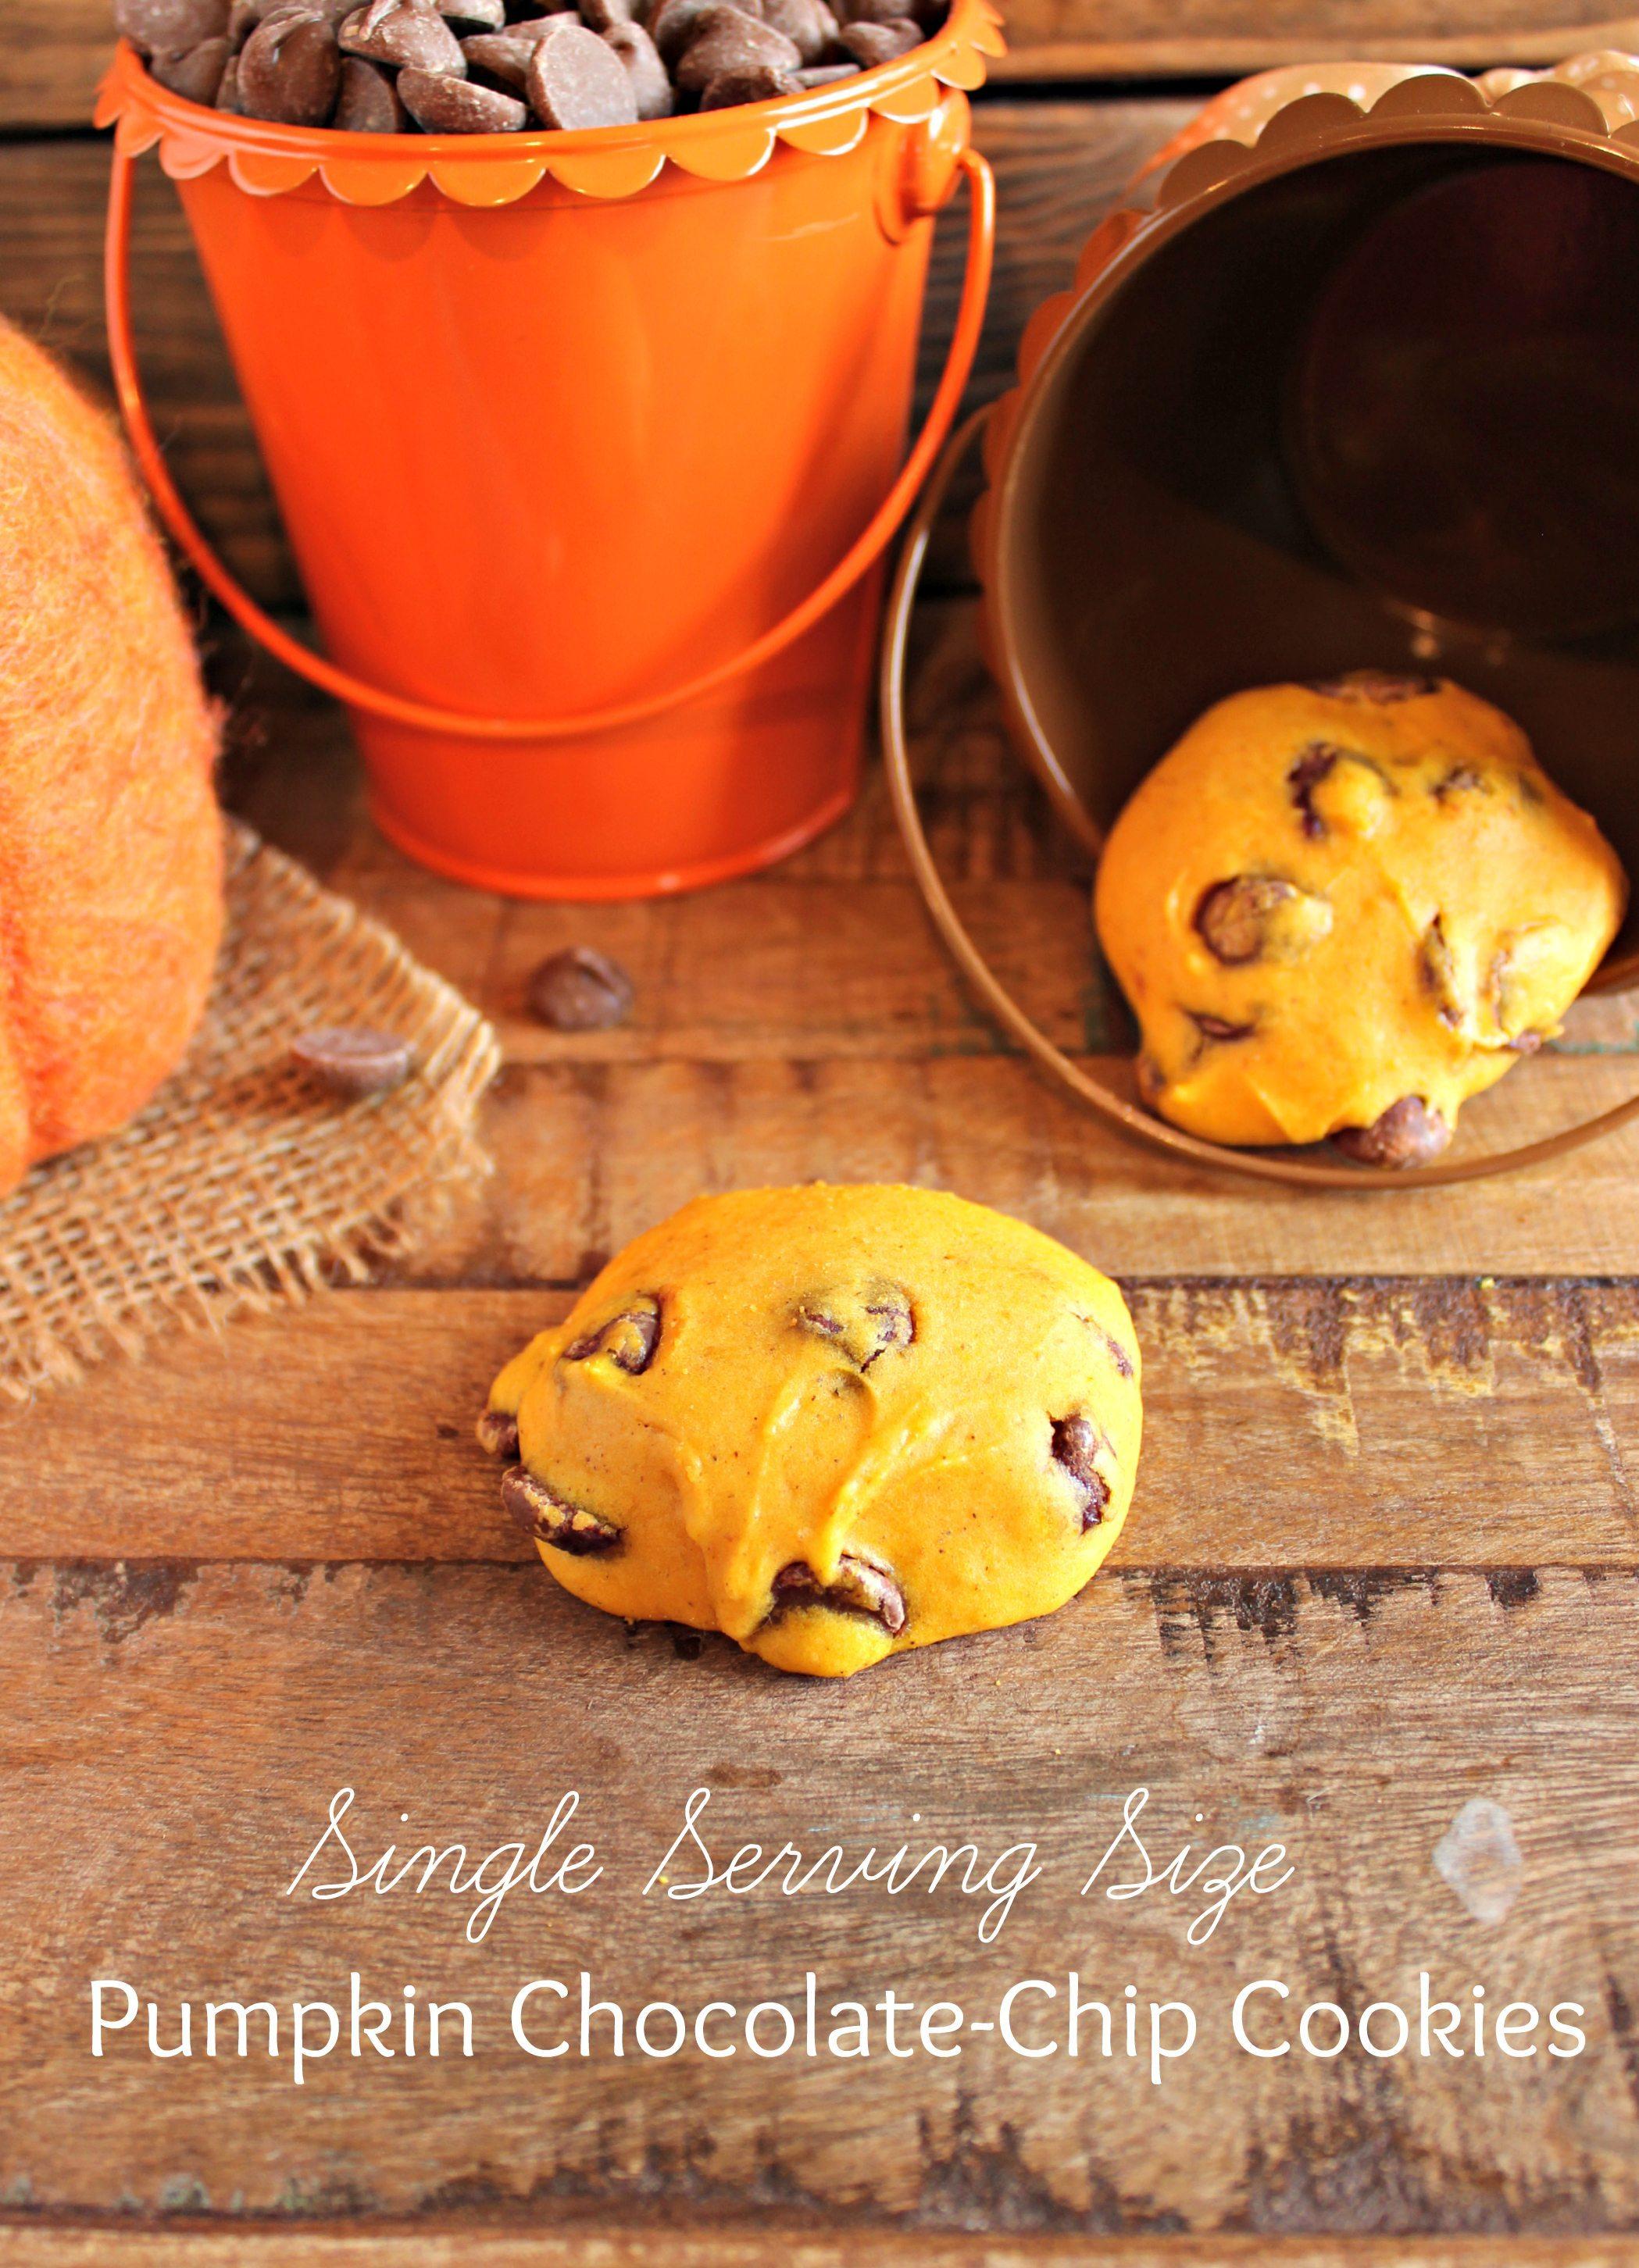 Single-Serving Size} Pumpkin Chocolate Chip Cookies - Chelsea's ...